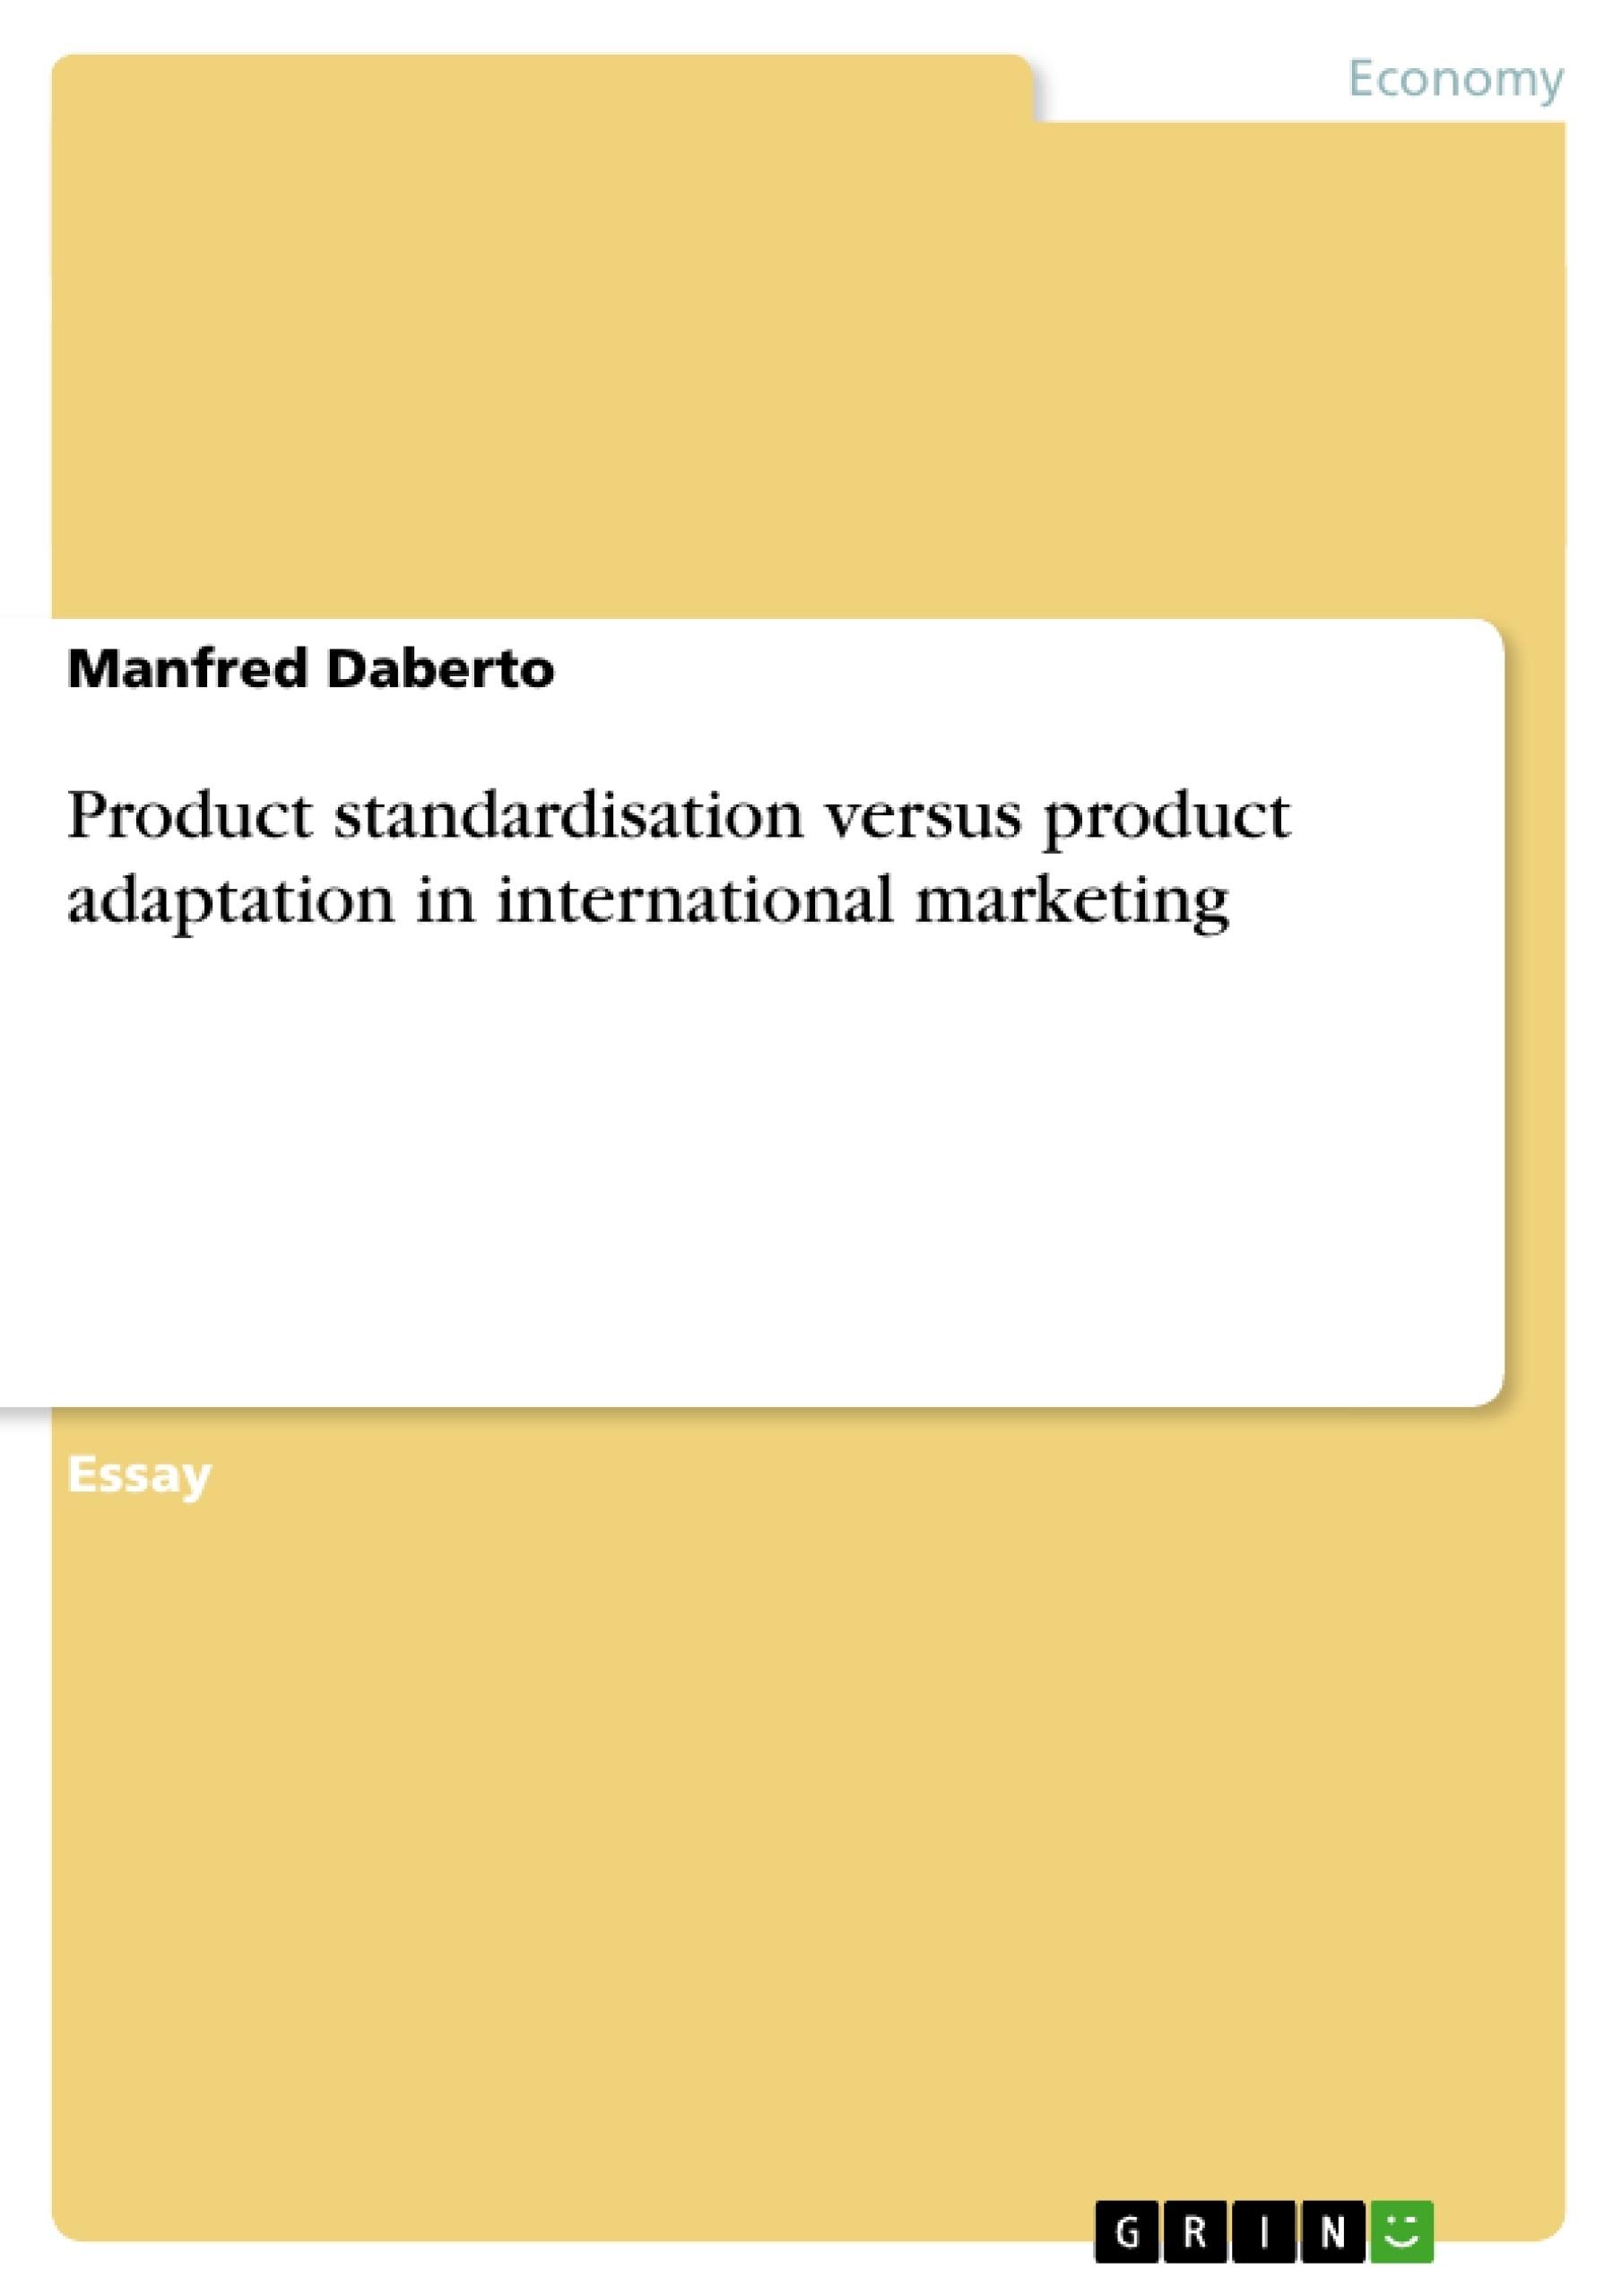 Title: Product standardisation versus product adaptation in international marketing